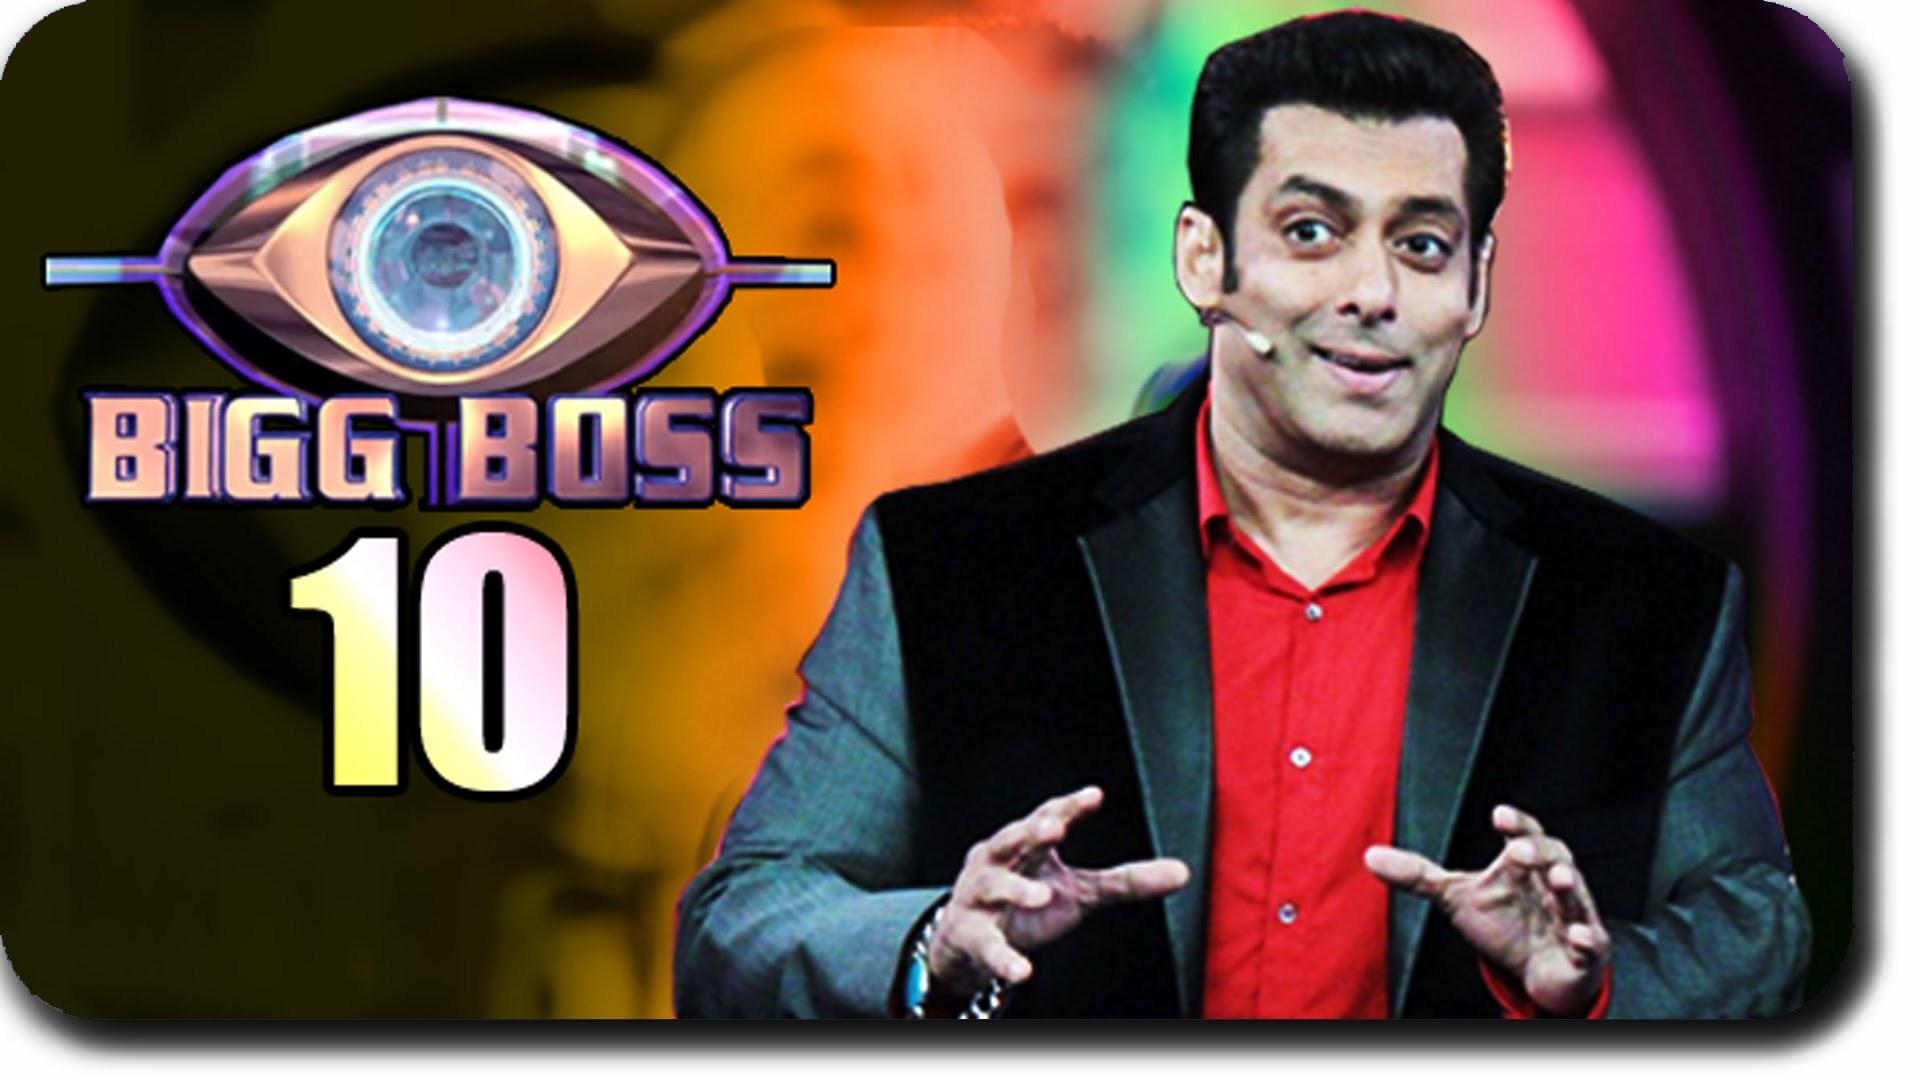 BIGG BOSS SEASON 10 - Reviews, Tv Serials, Tv episodes, Tv shows